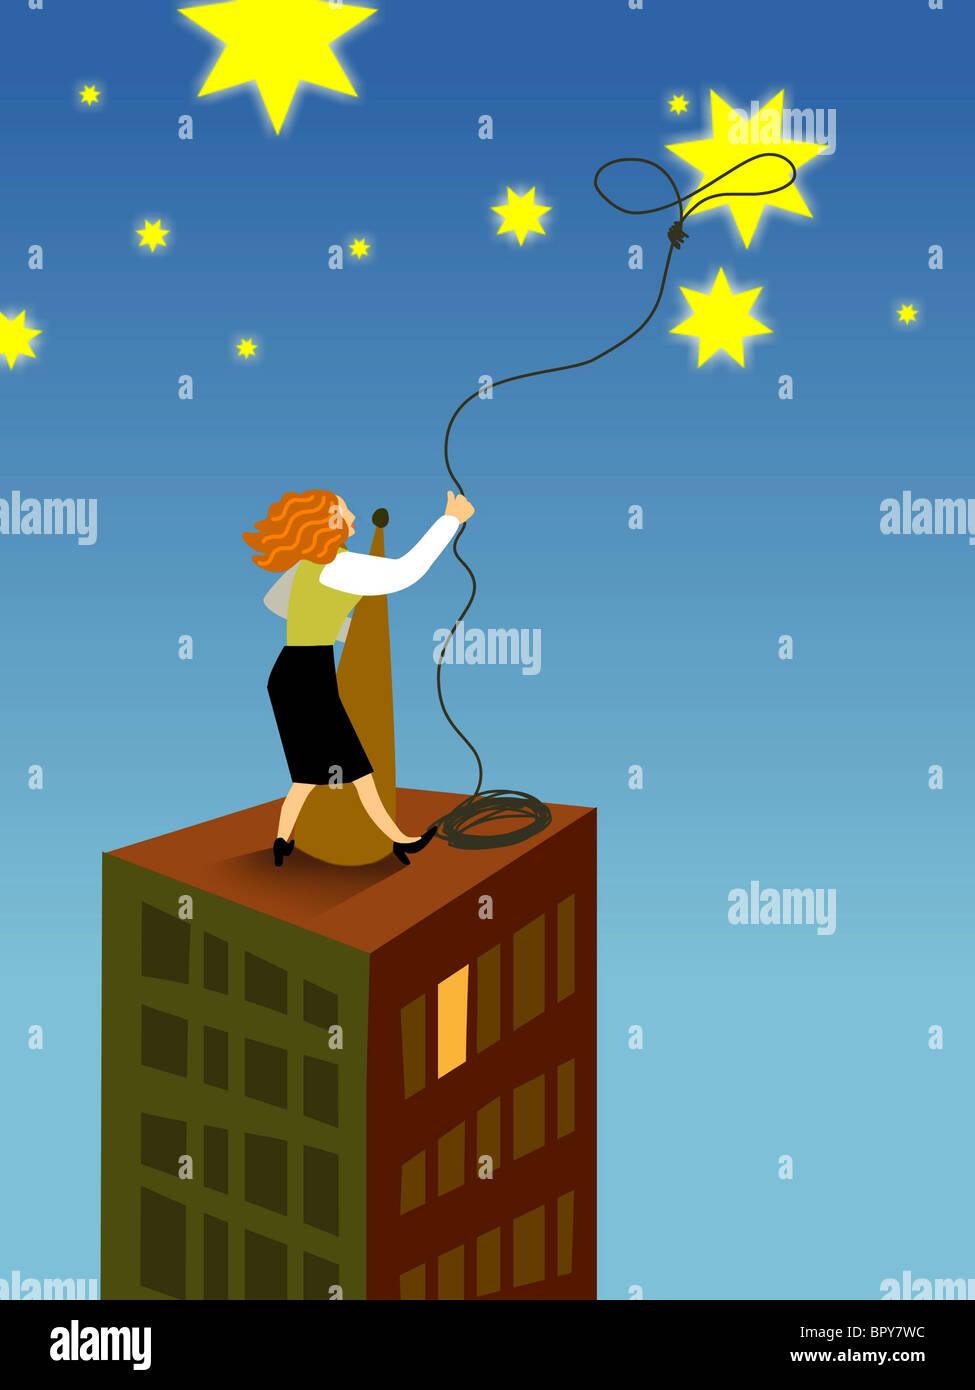 Una empresaria lassoing una estrella del cielo. Imagen De Stock